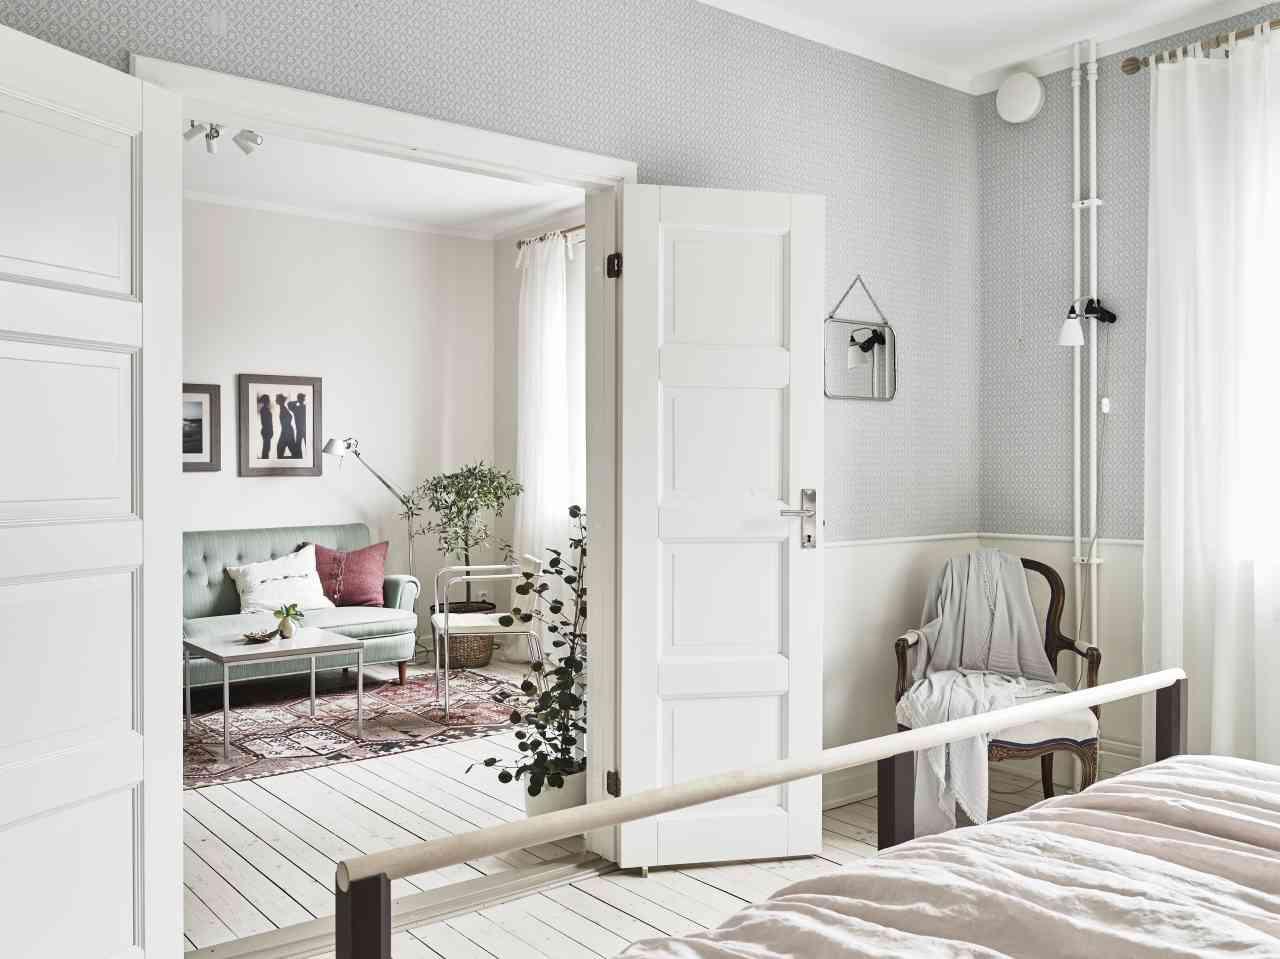 decoración de interiores - casa - salon - dormitorio